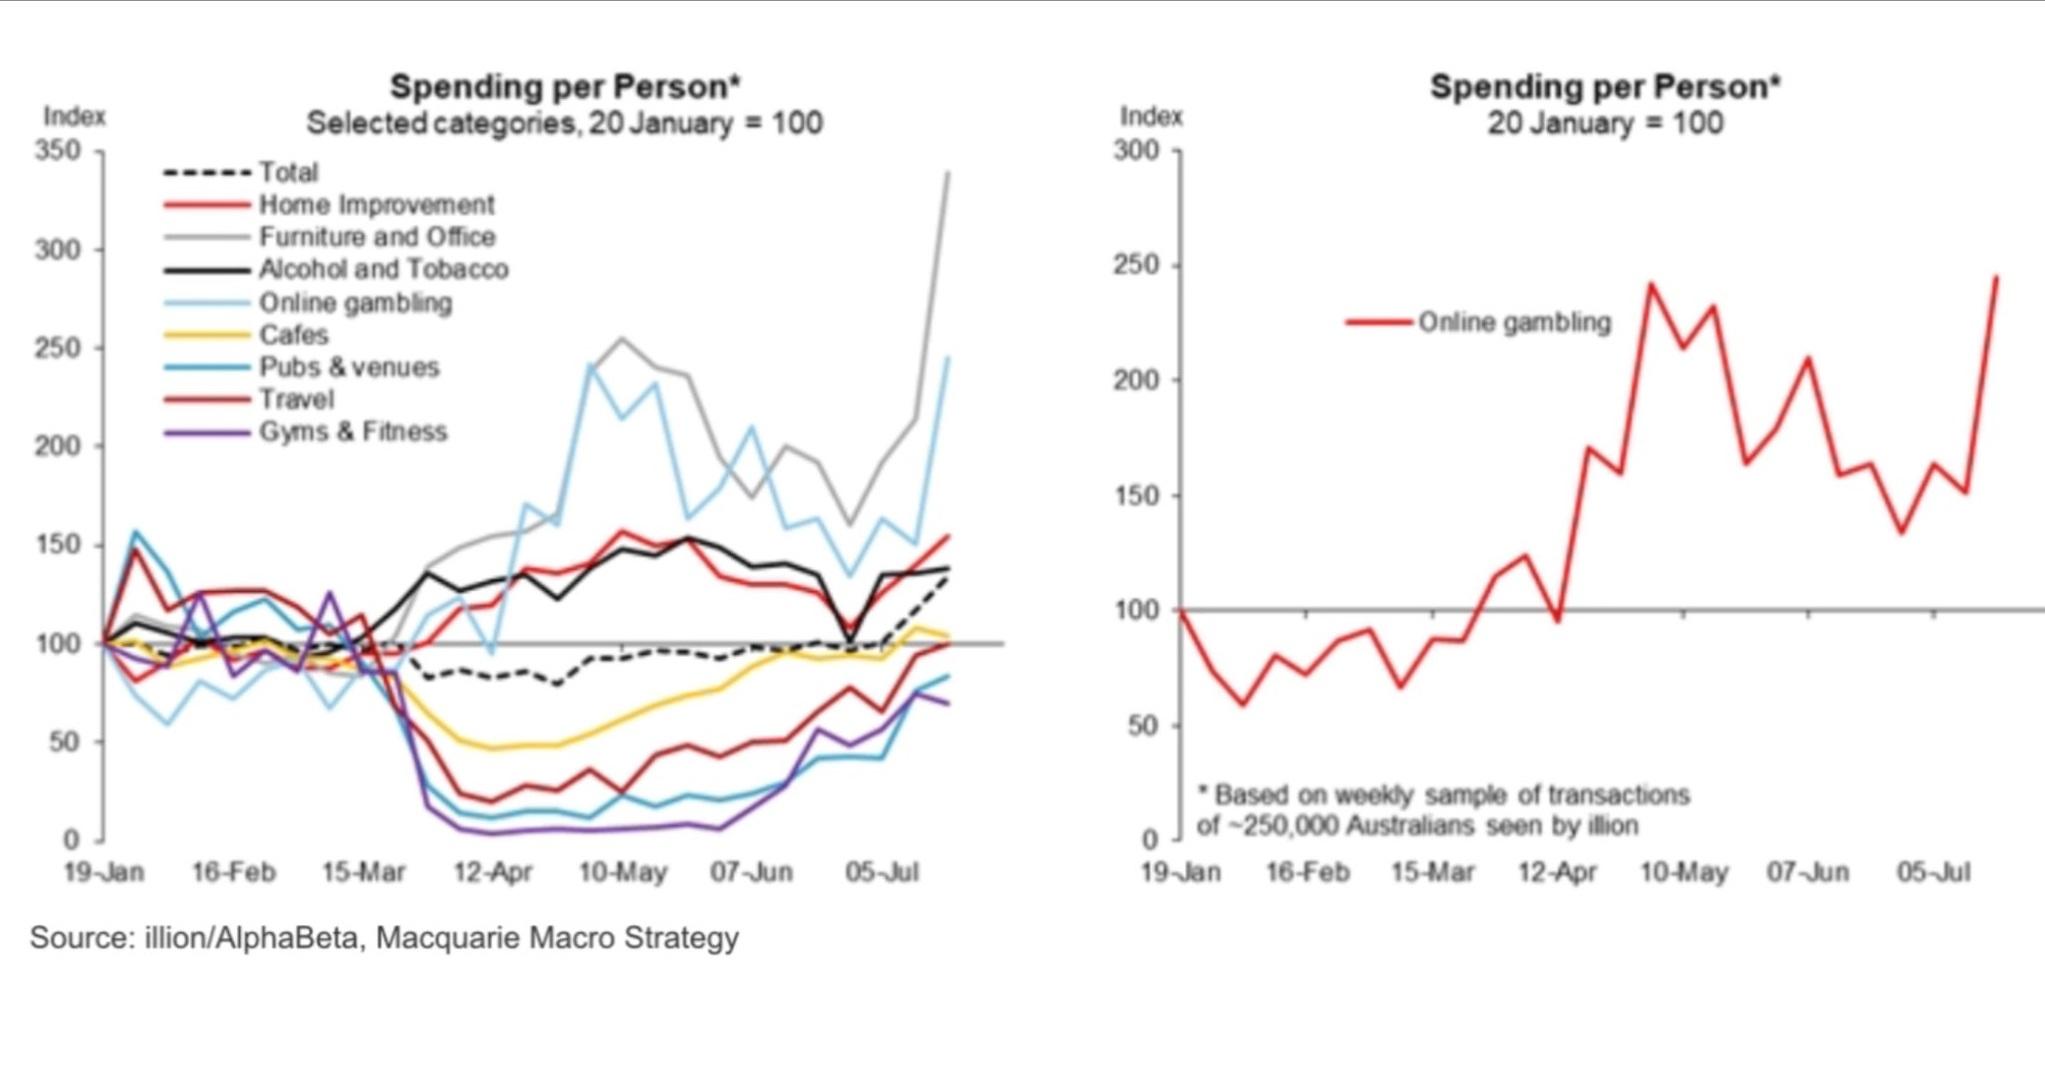 Spending Per Person